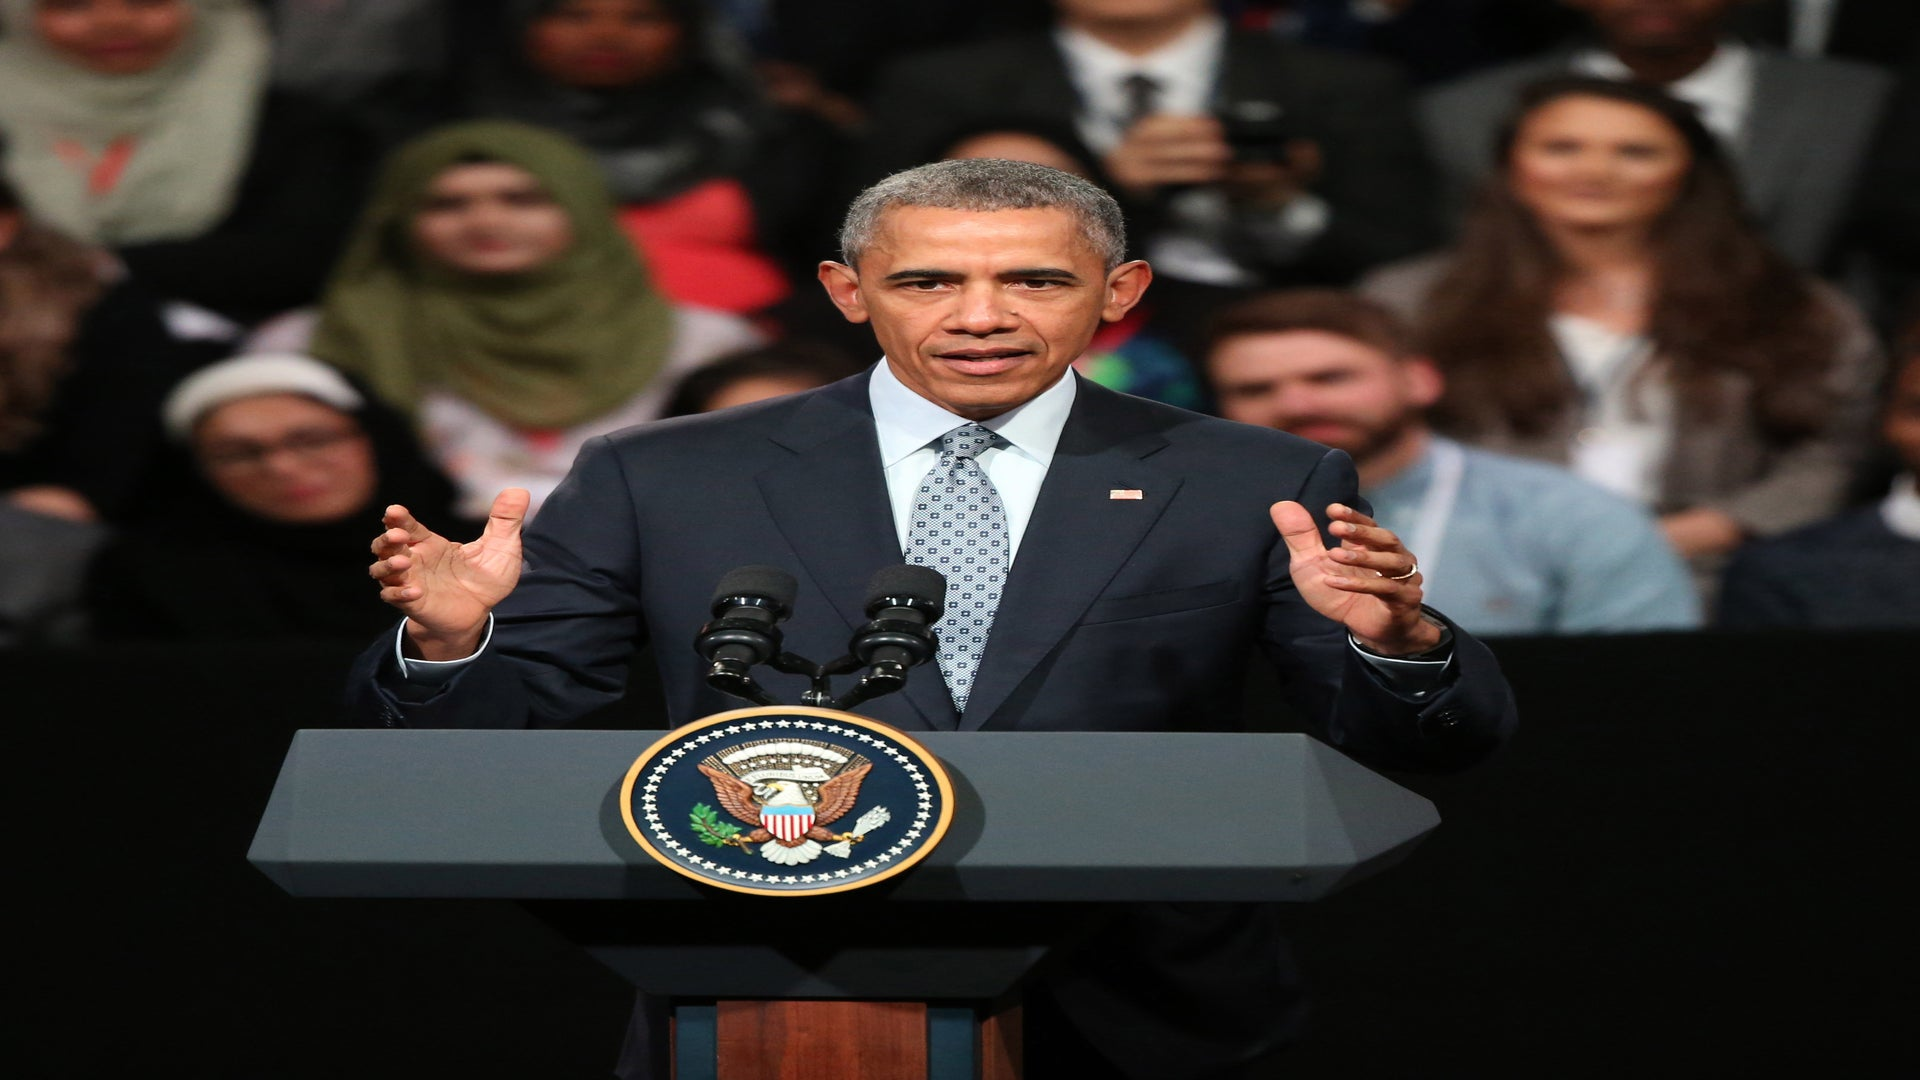 President Obama Grants Clemency to 42 Prisoners